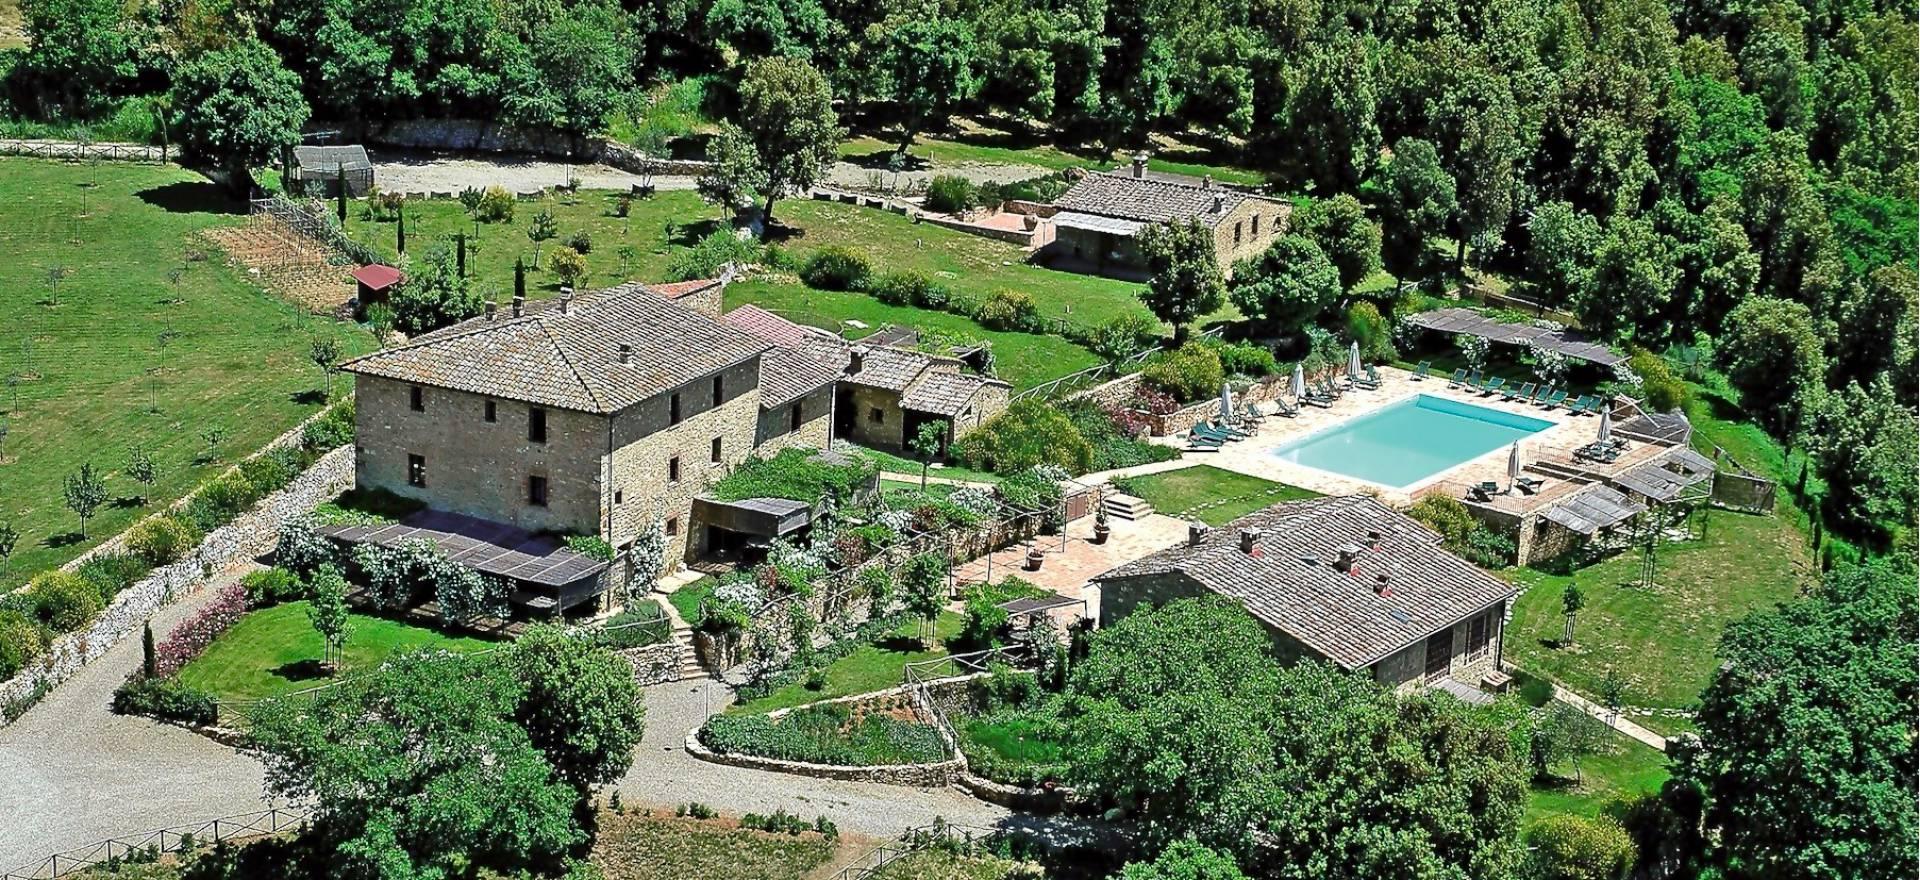 Agriturismo Toscana Agriturismo per chi ama pace e comodità, in Toscana